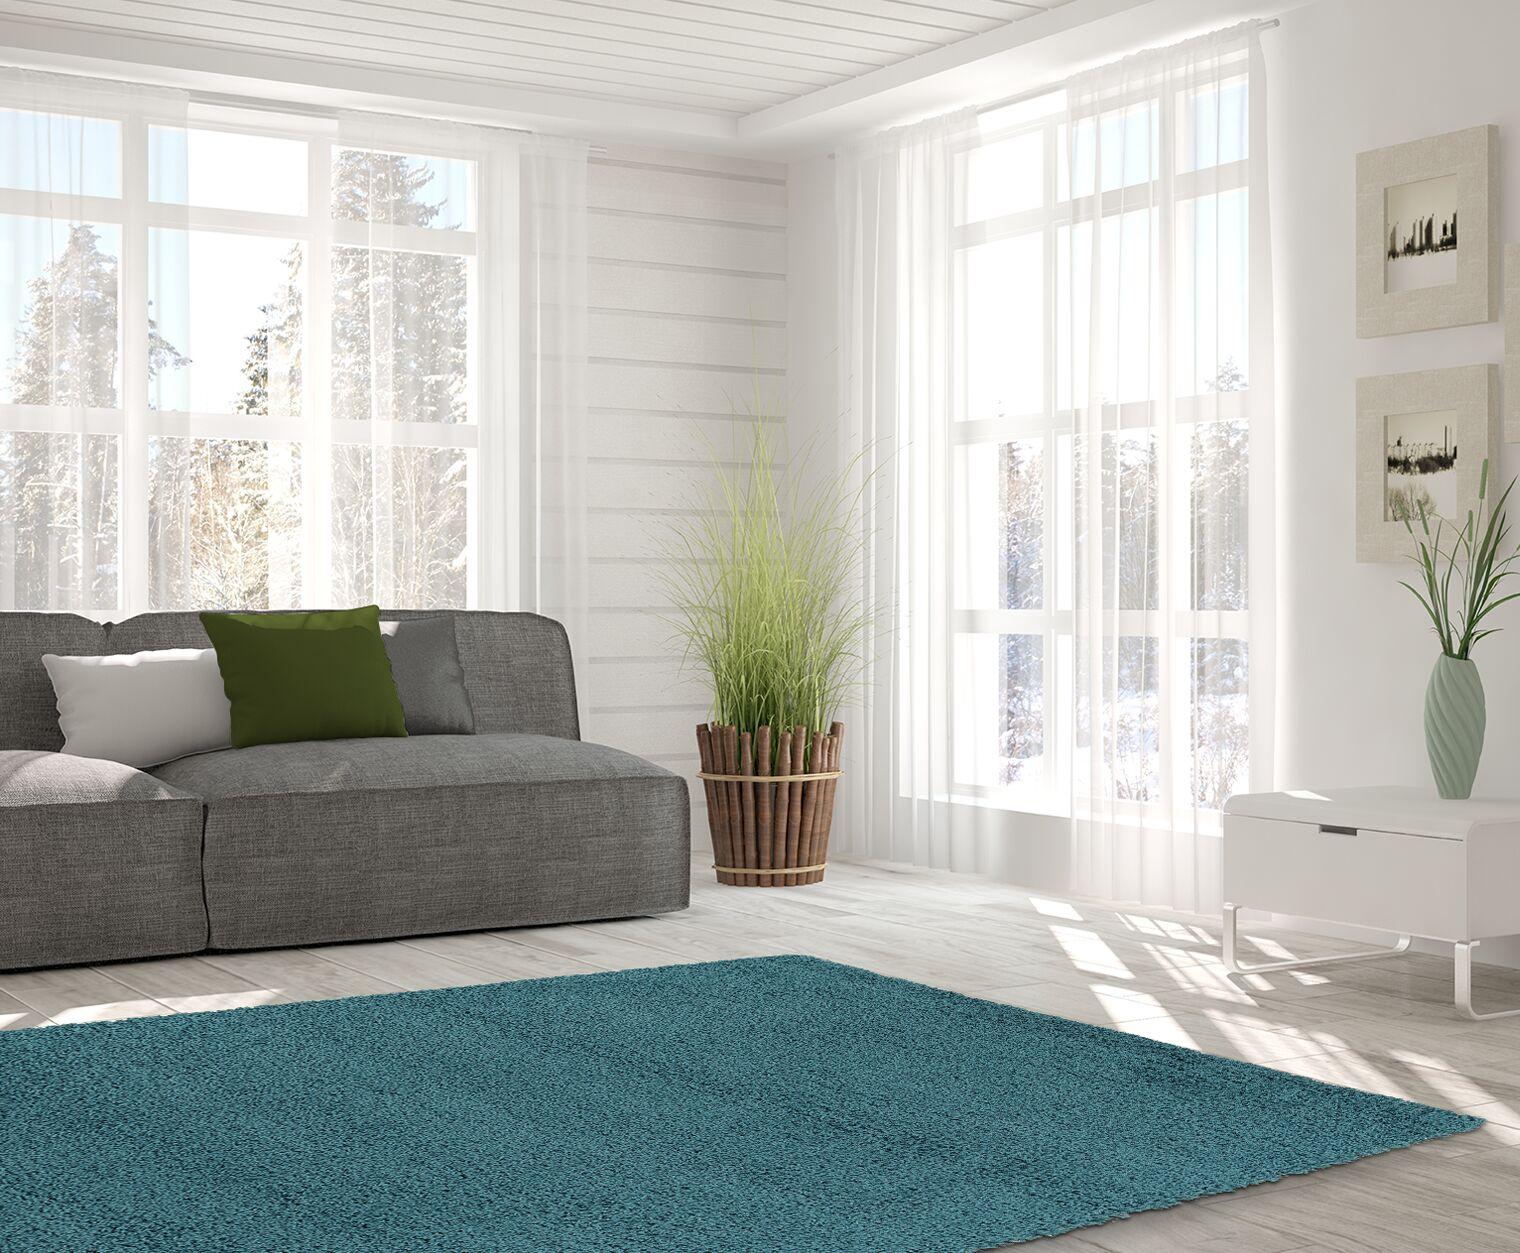 Kleiman Shaggy Solid Turquoise Area Rug Rug Size: 8' x 10'